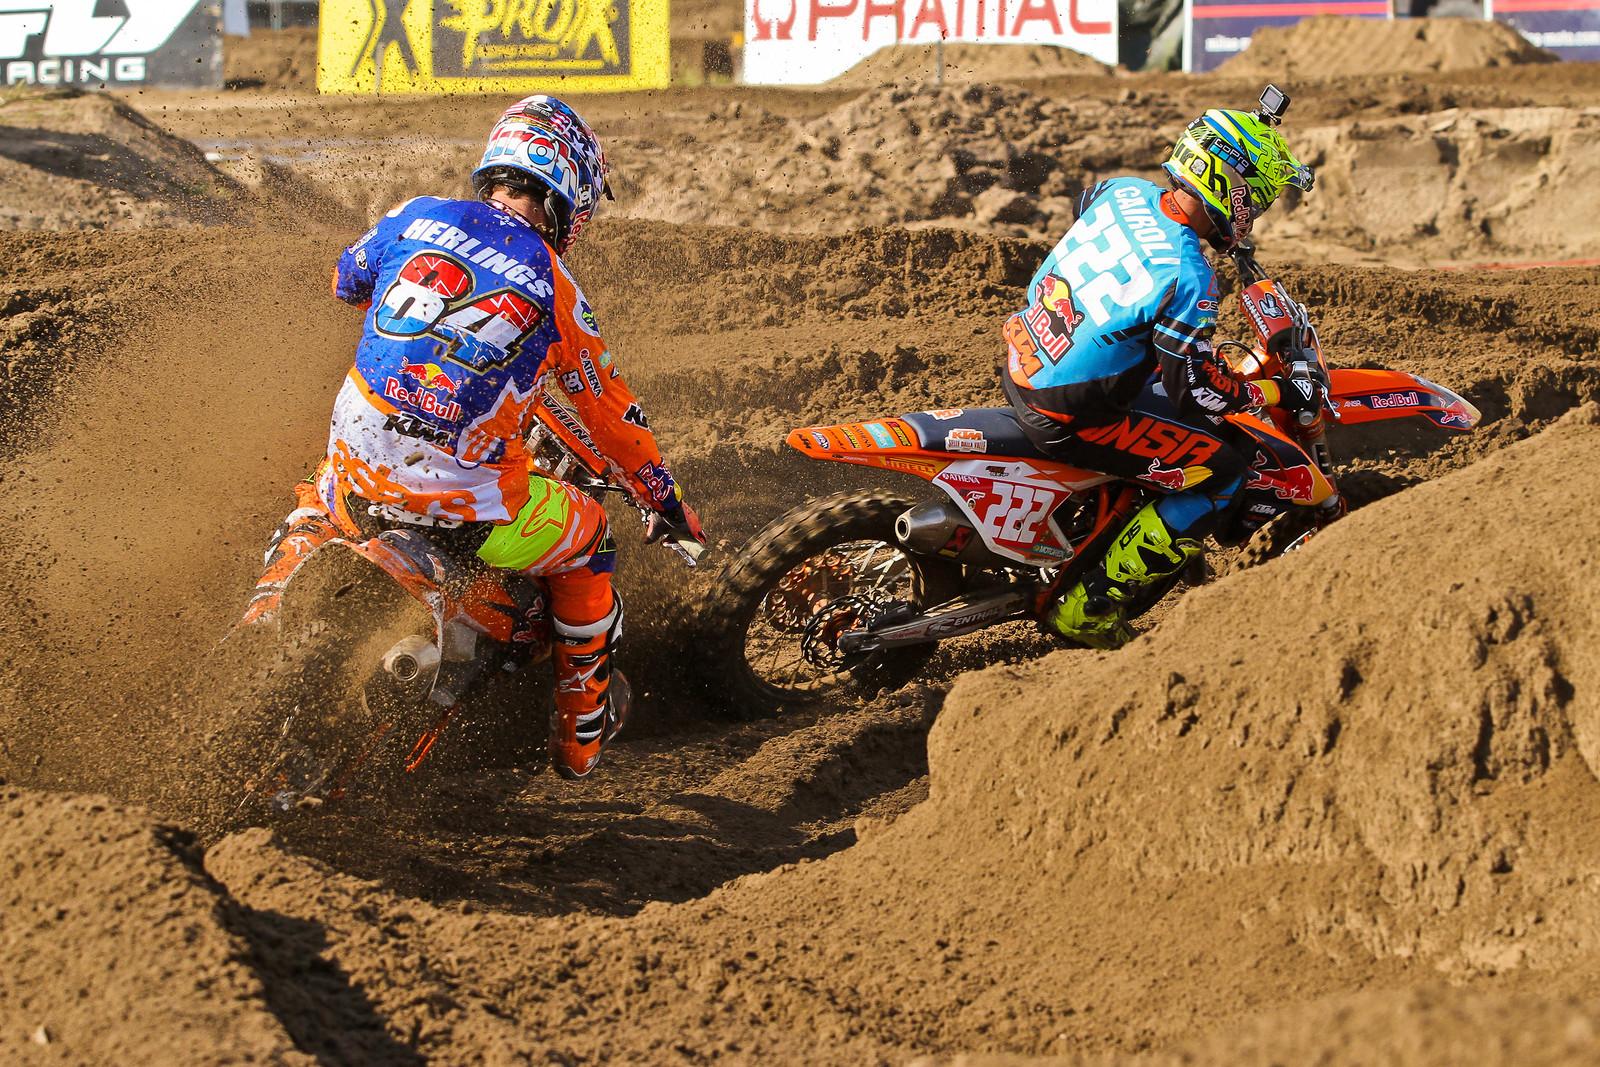 Jeffrey Herlings / Antonio Cairoli Battle - ayearinmx - Motocross Pictures - Vital MX